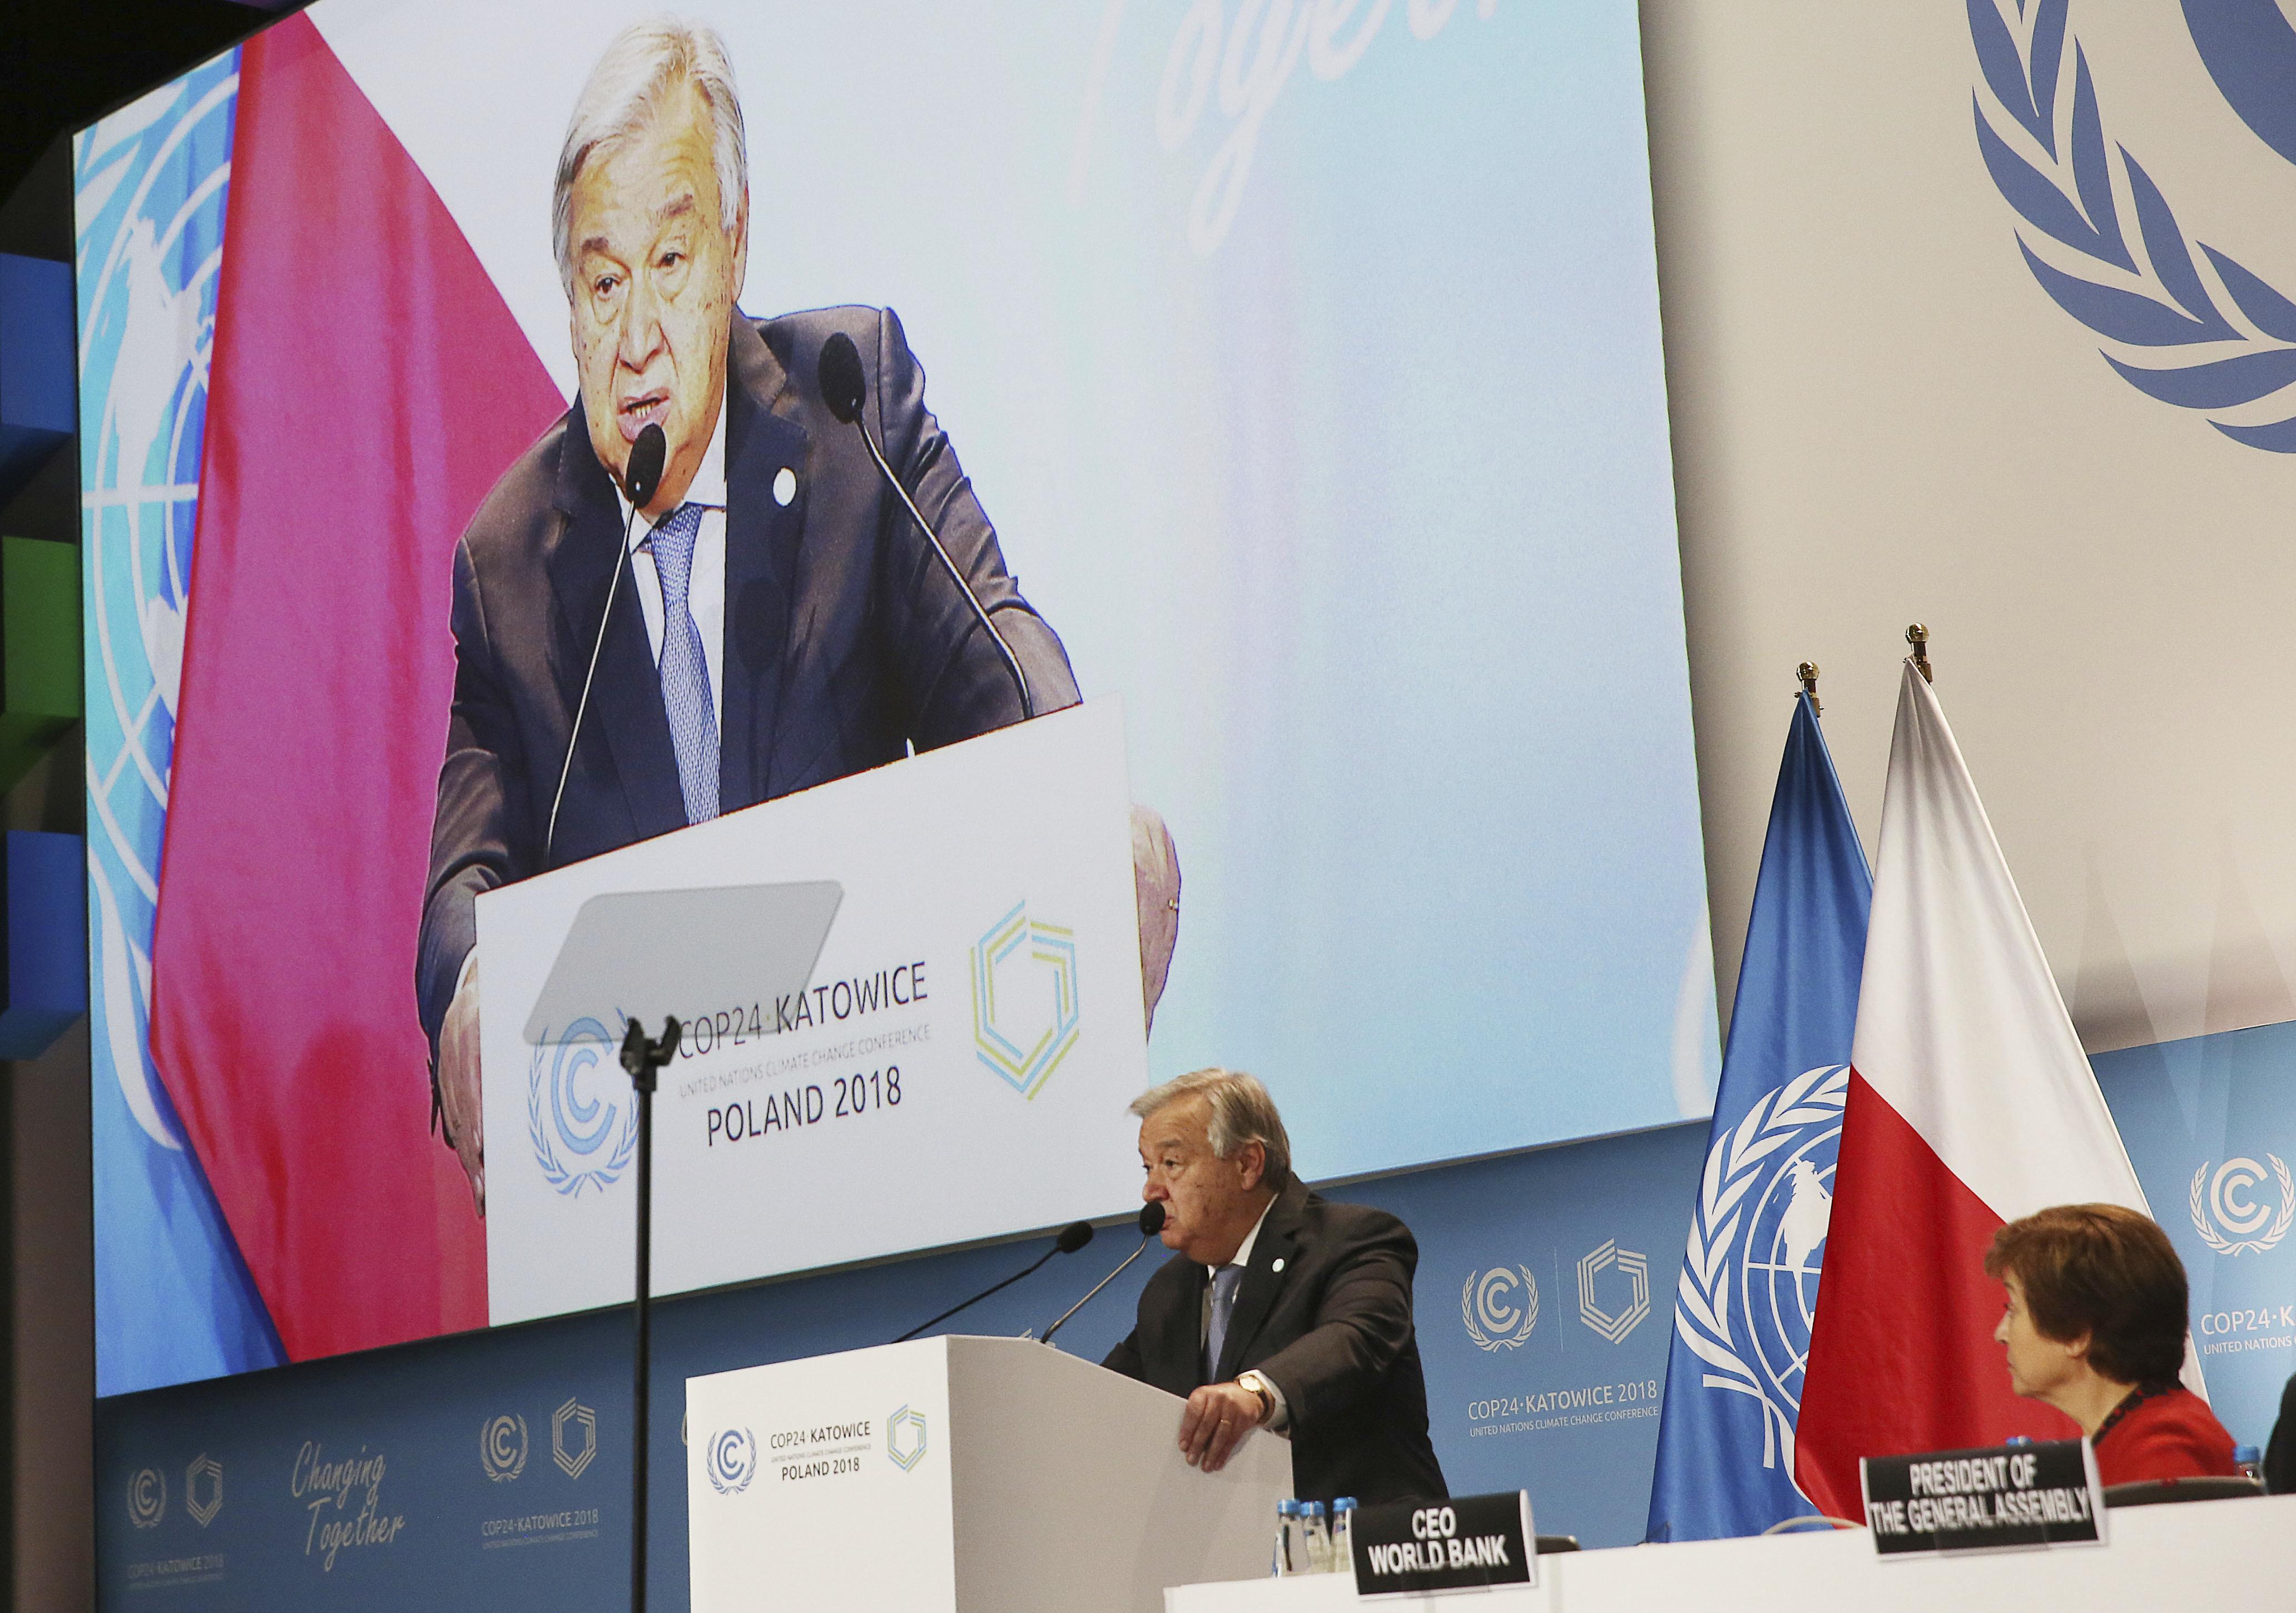 UN Secretary General Antonio Guterres delivers a speech WLduring the opening of COP24 UN Climate Change Conference 2018 in Katowice, Poland, Monday, Dec. 3, 2018.(AP Photo/Czarek Sokolowski)